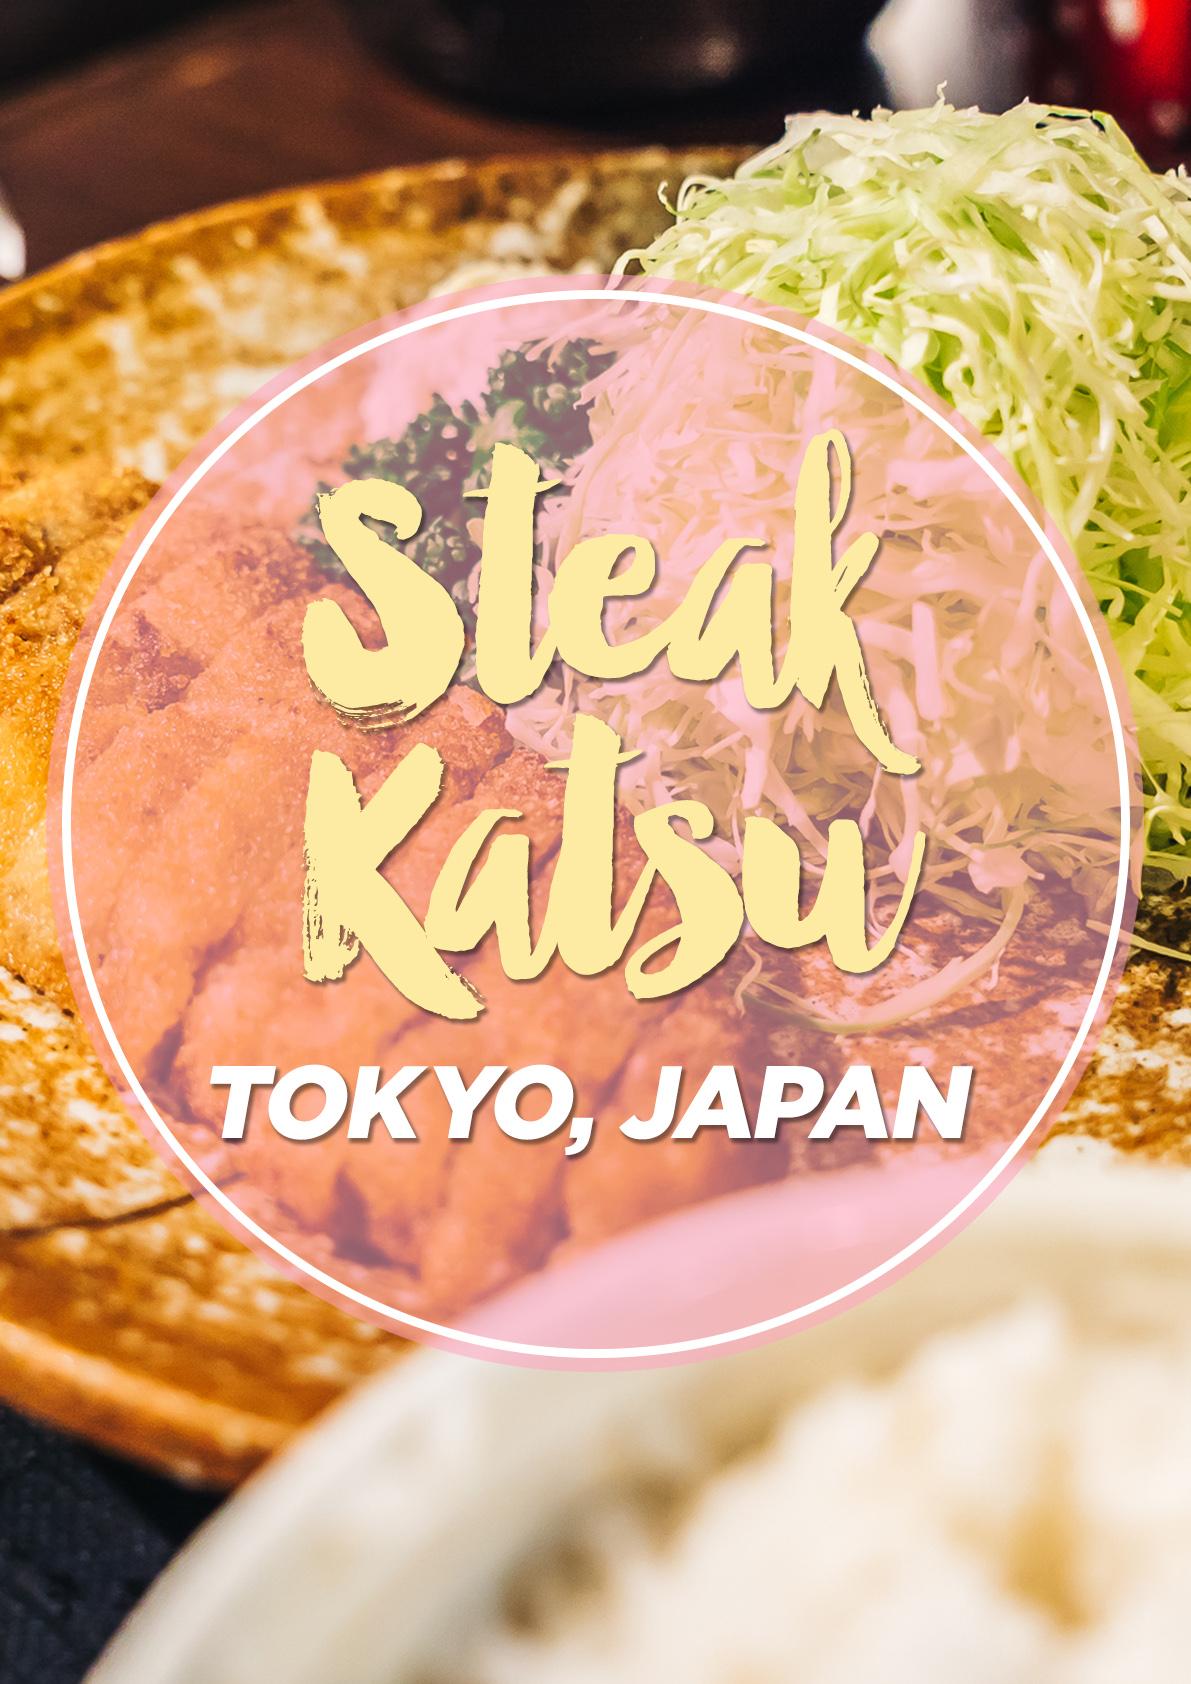 Steak Katsu www.thetravelpockets.com